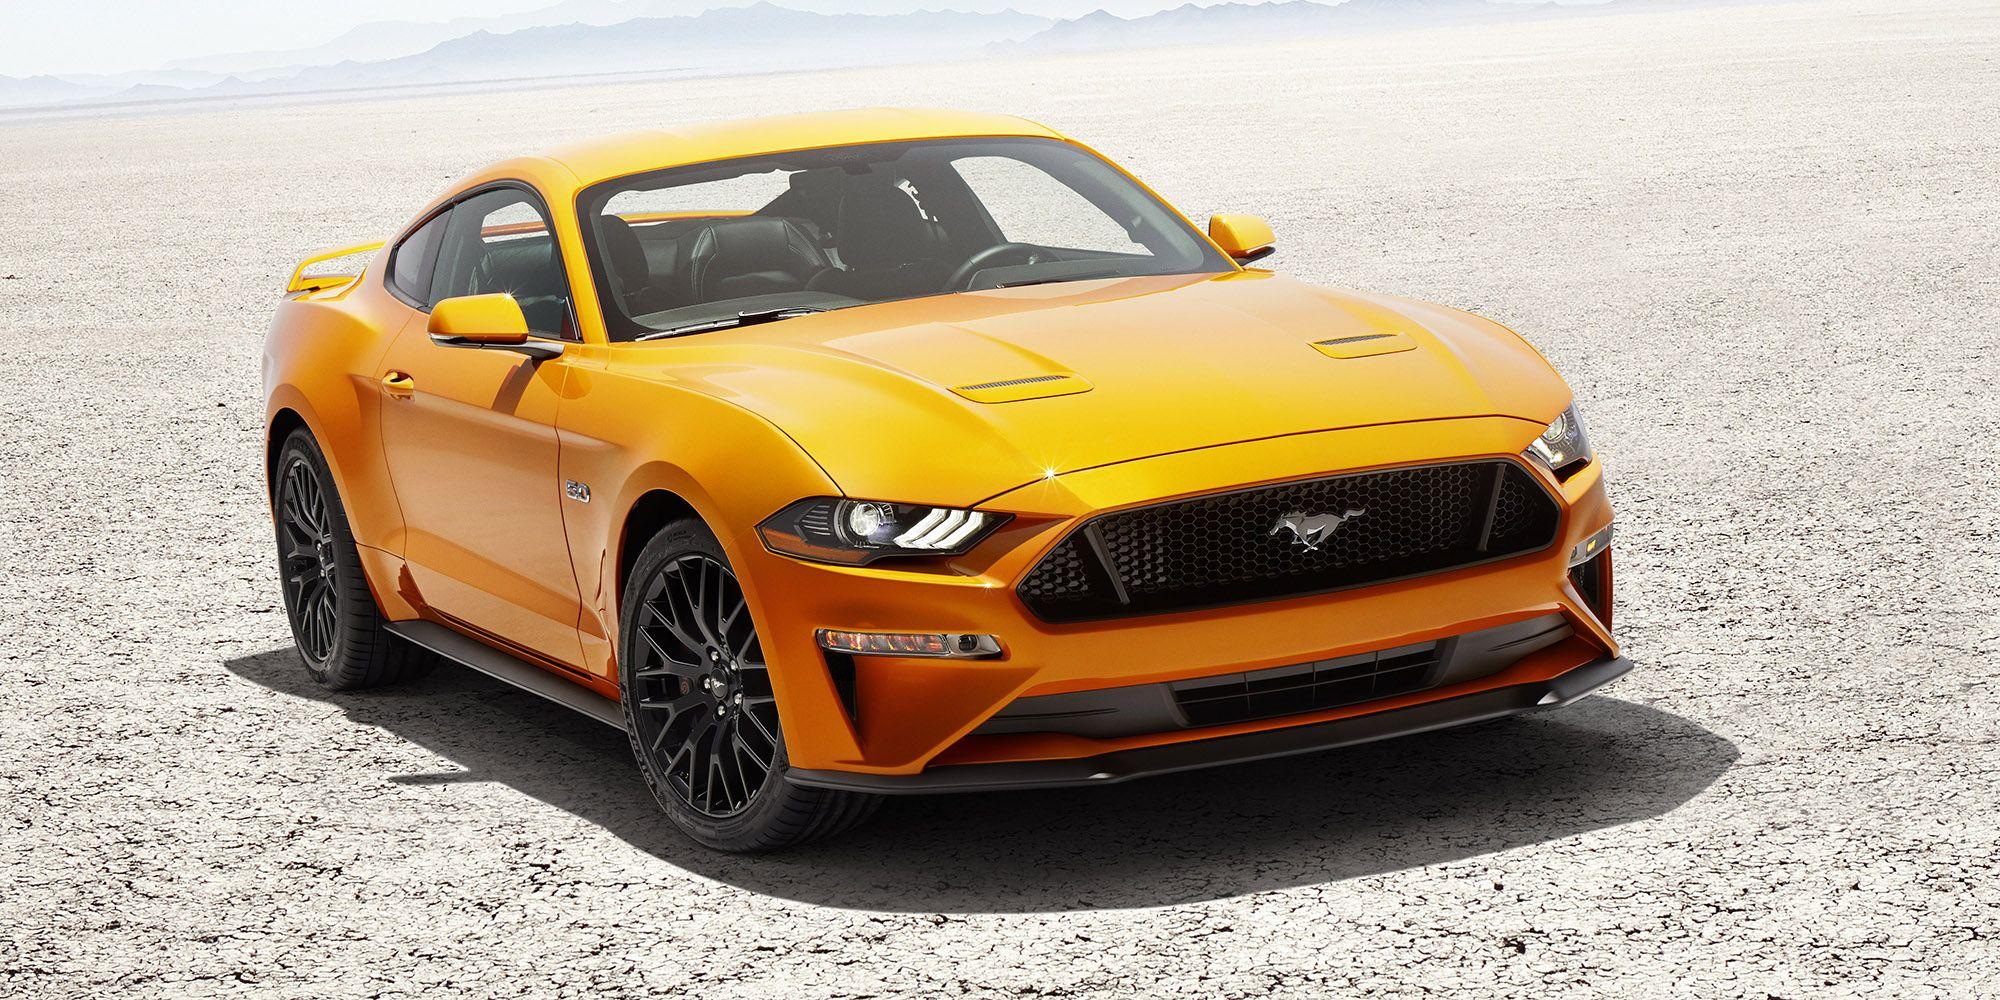 Mustang Gt 0 60 >> 2018 Ford Mustang Specs Mustang Gt Horsepower 0 60